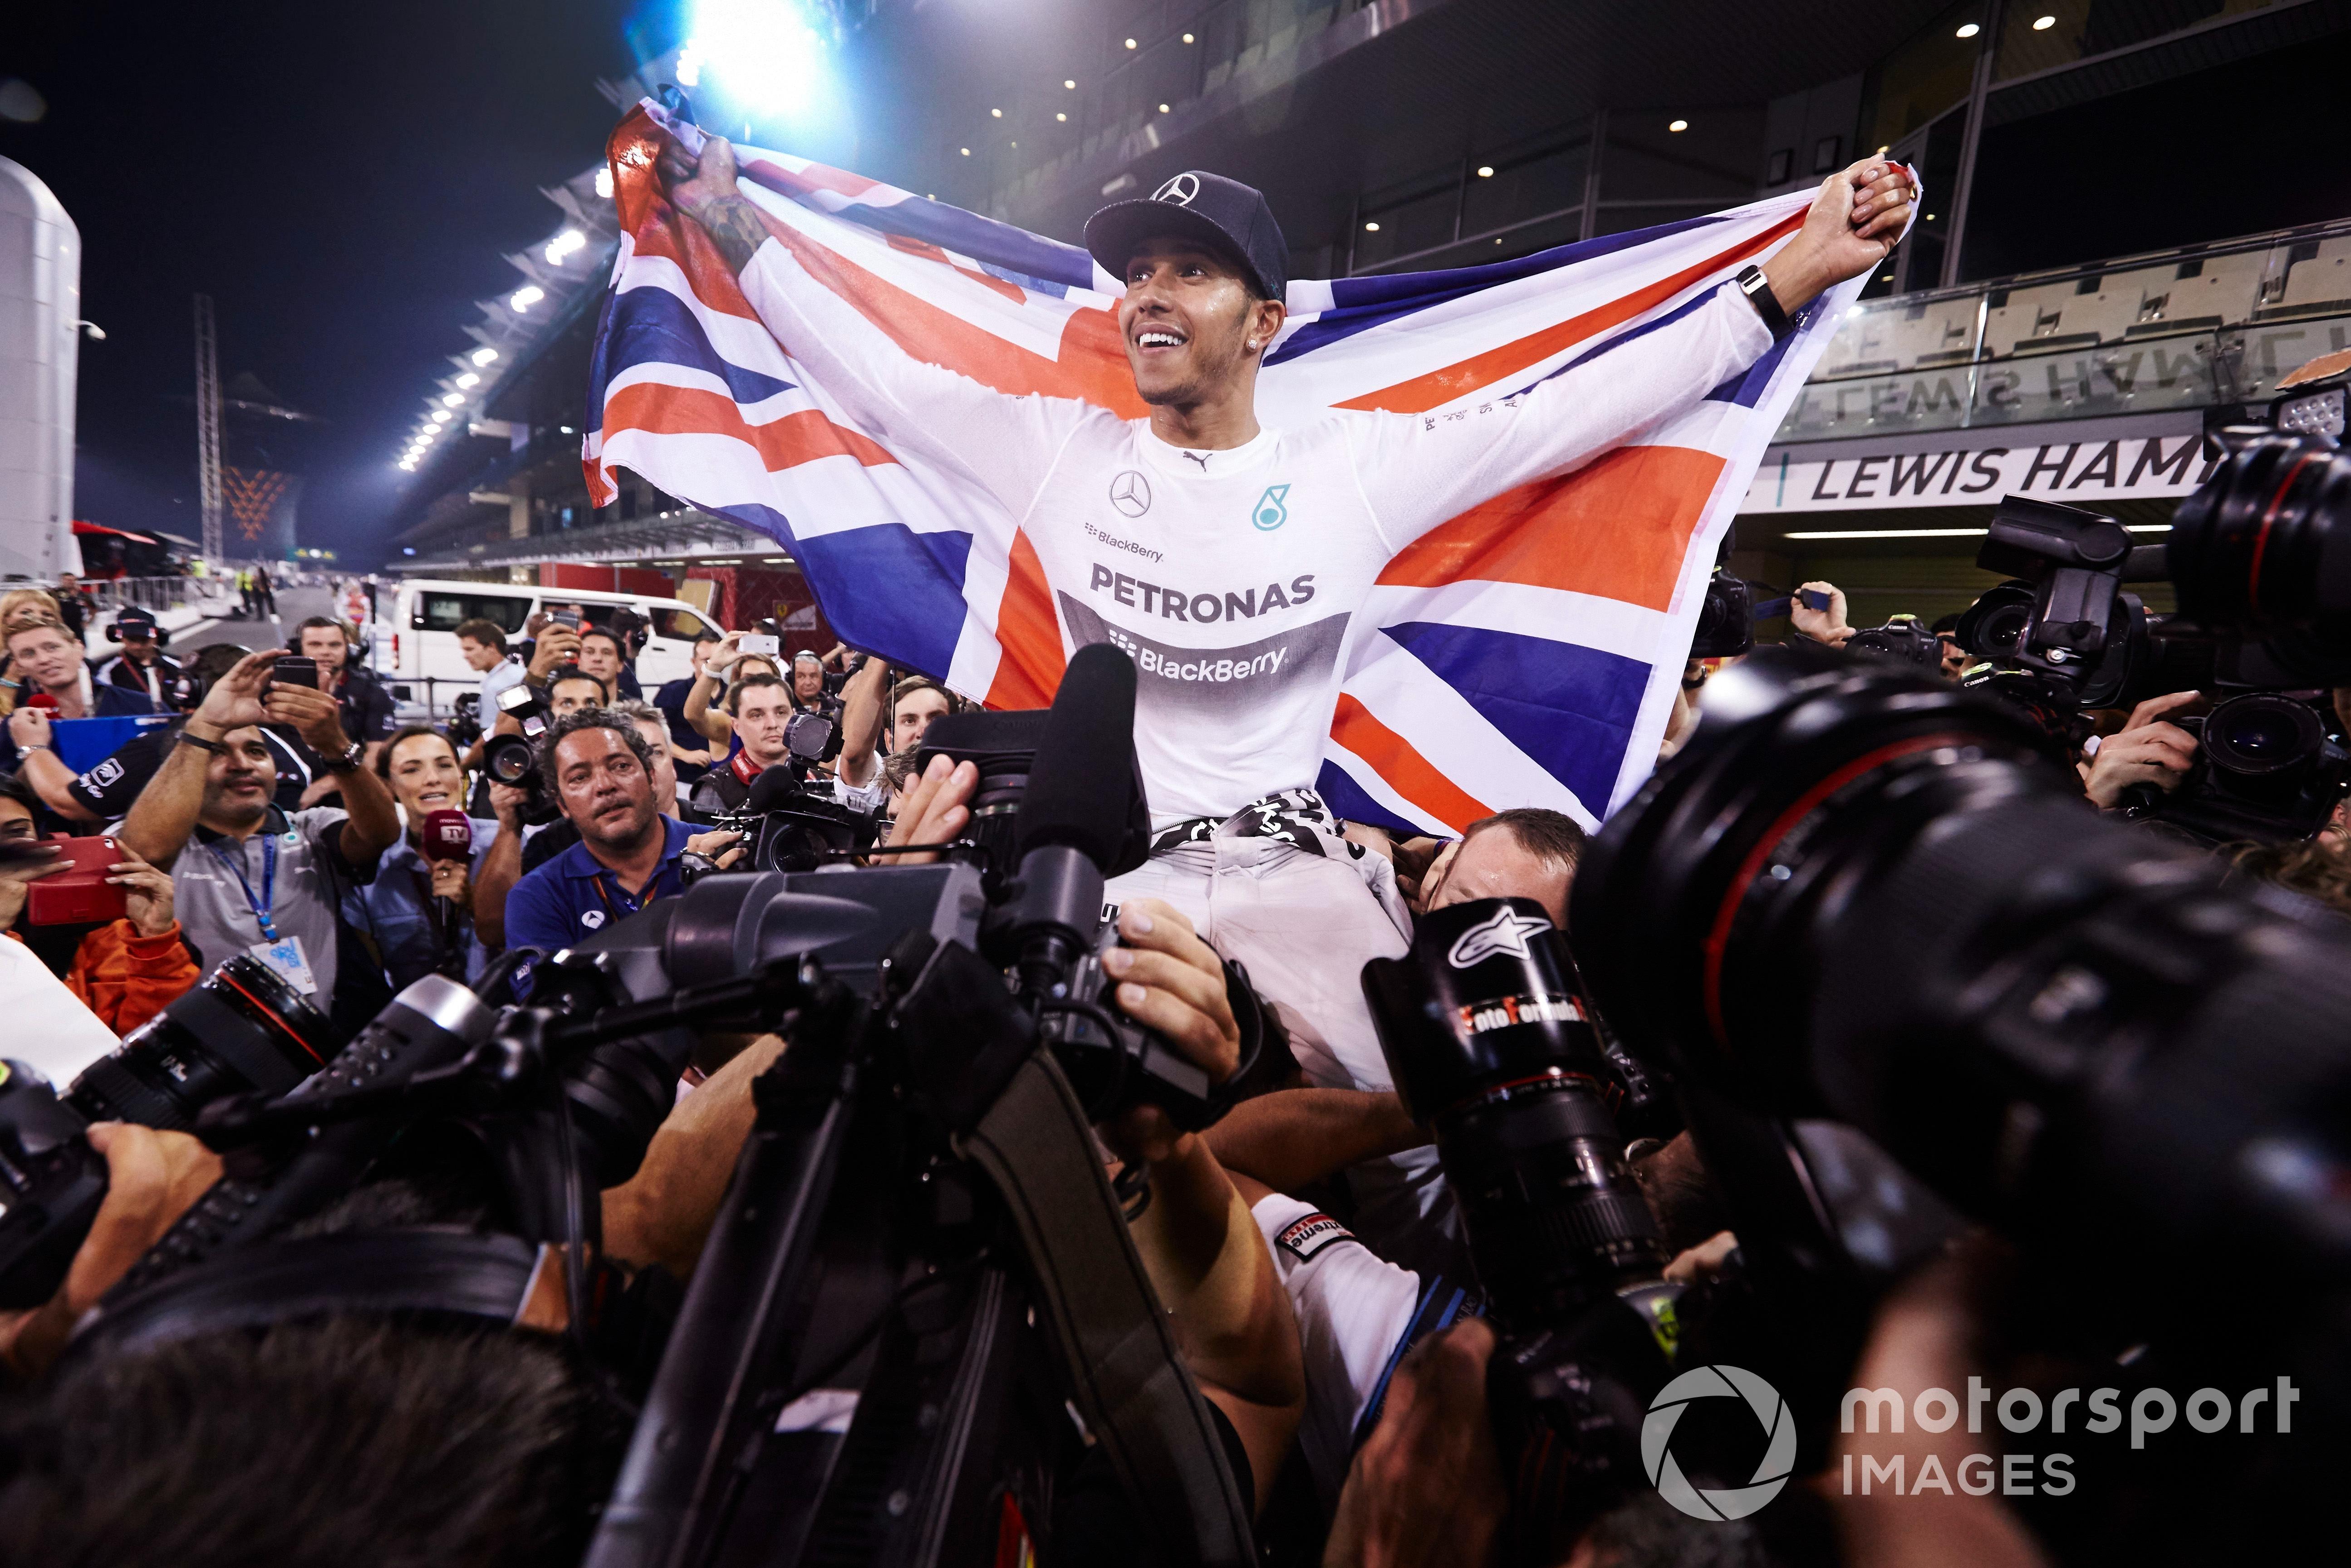 Lewis Hamilton, 2014 Abu Dhabi GP